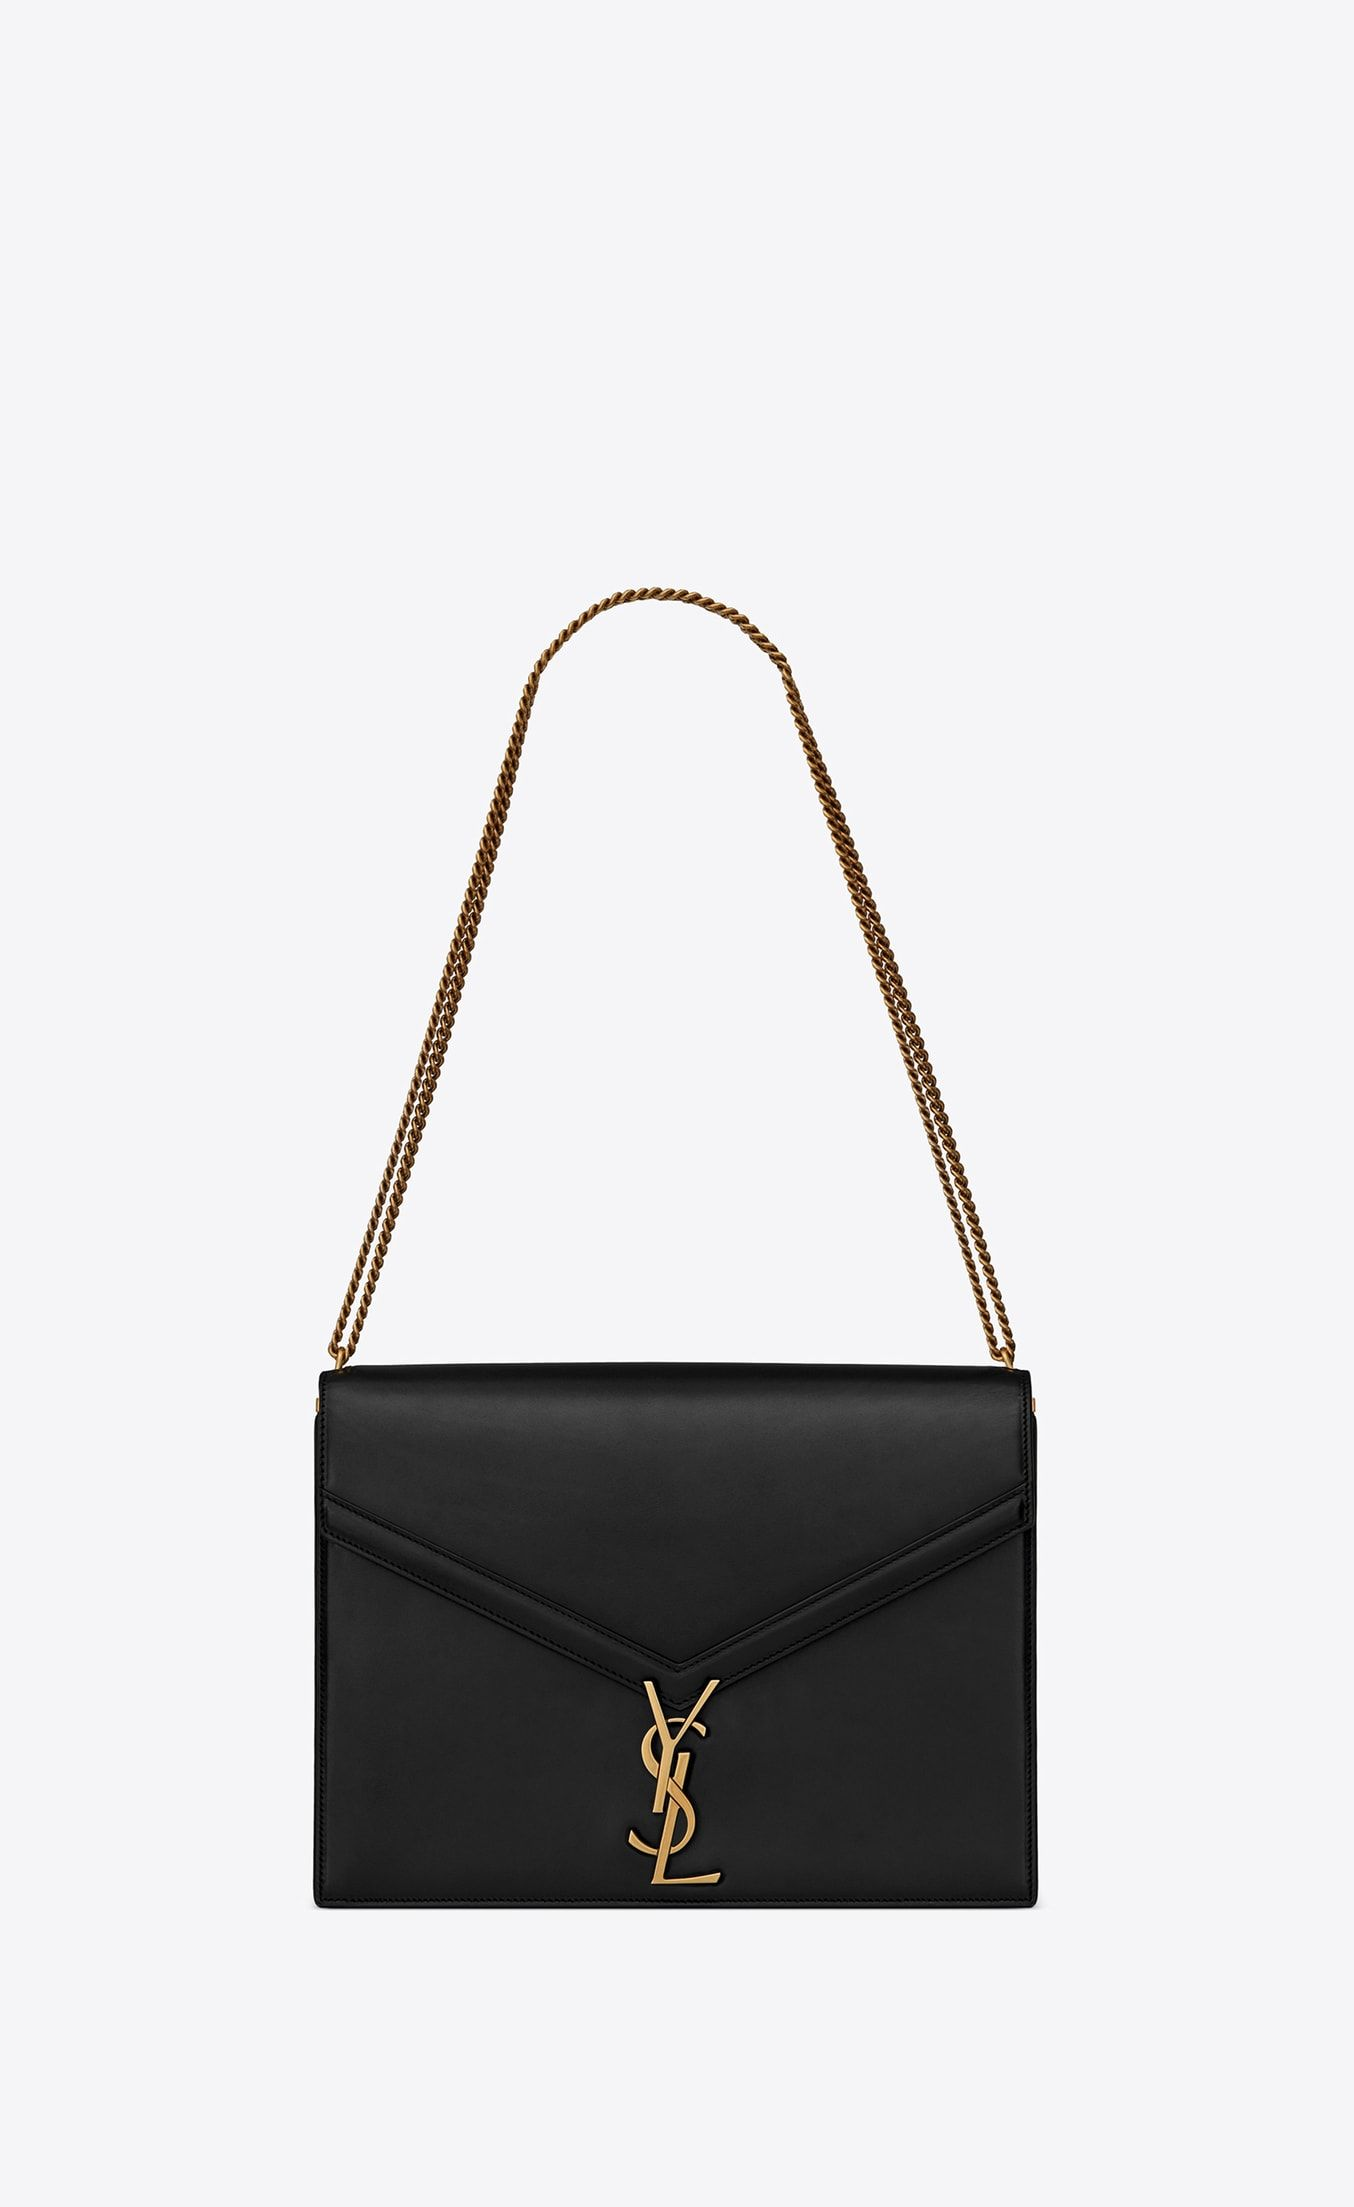 1c06fddad0bcf Cassandra Large bag with monogram slider in smooth leather | purses ...